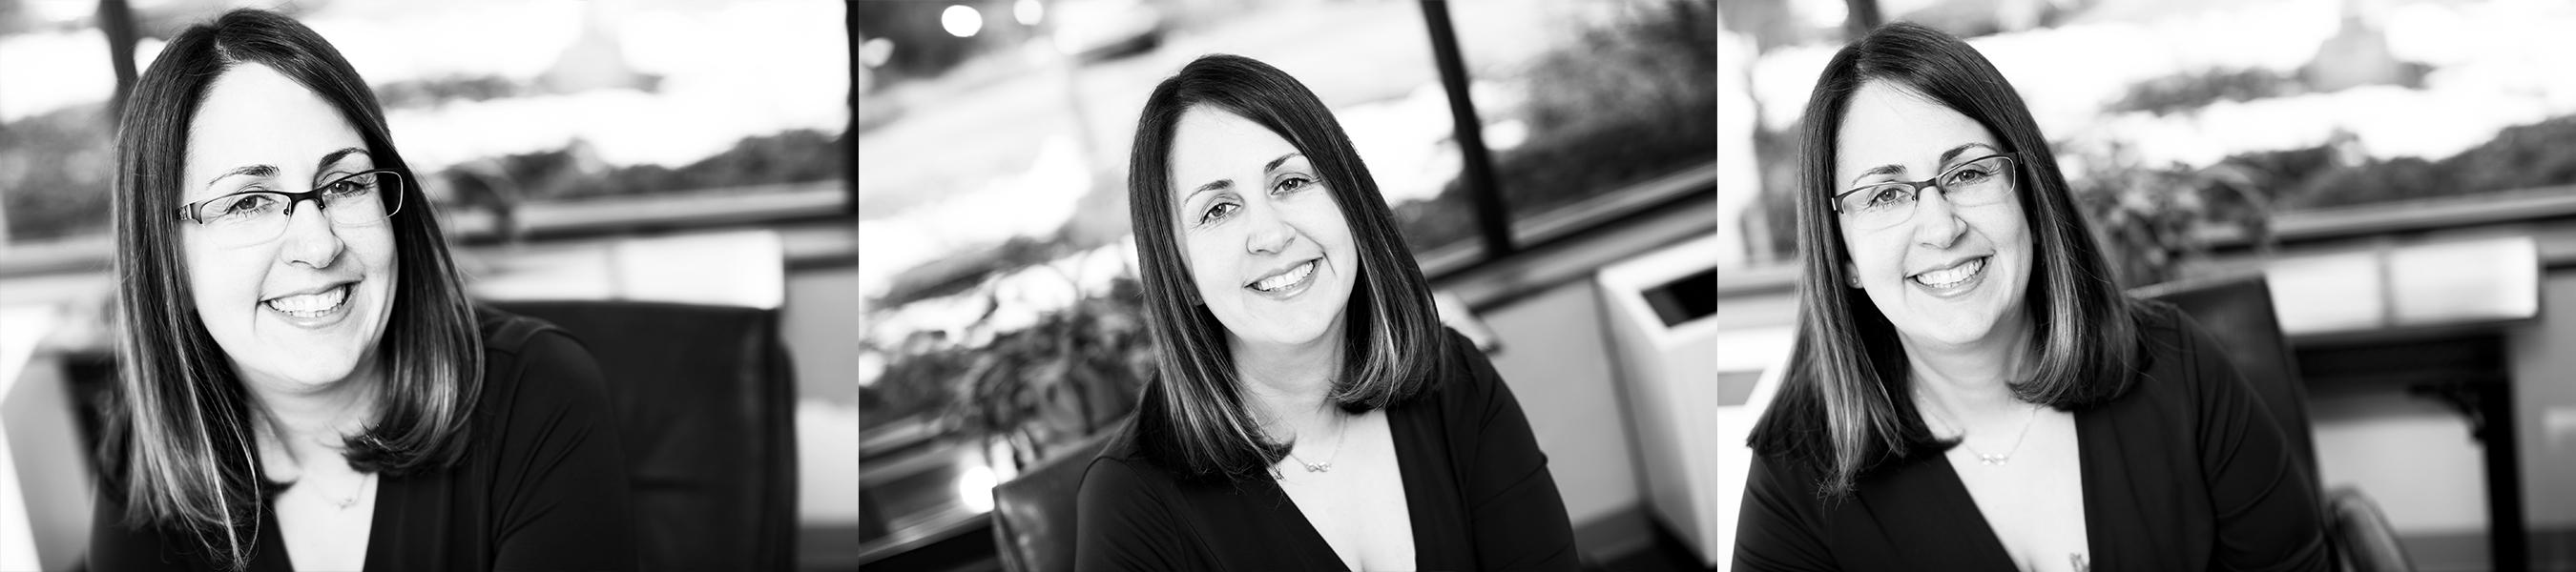 OUR ATTORNEYS: Eileen R. Fullerton – Managing Partner